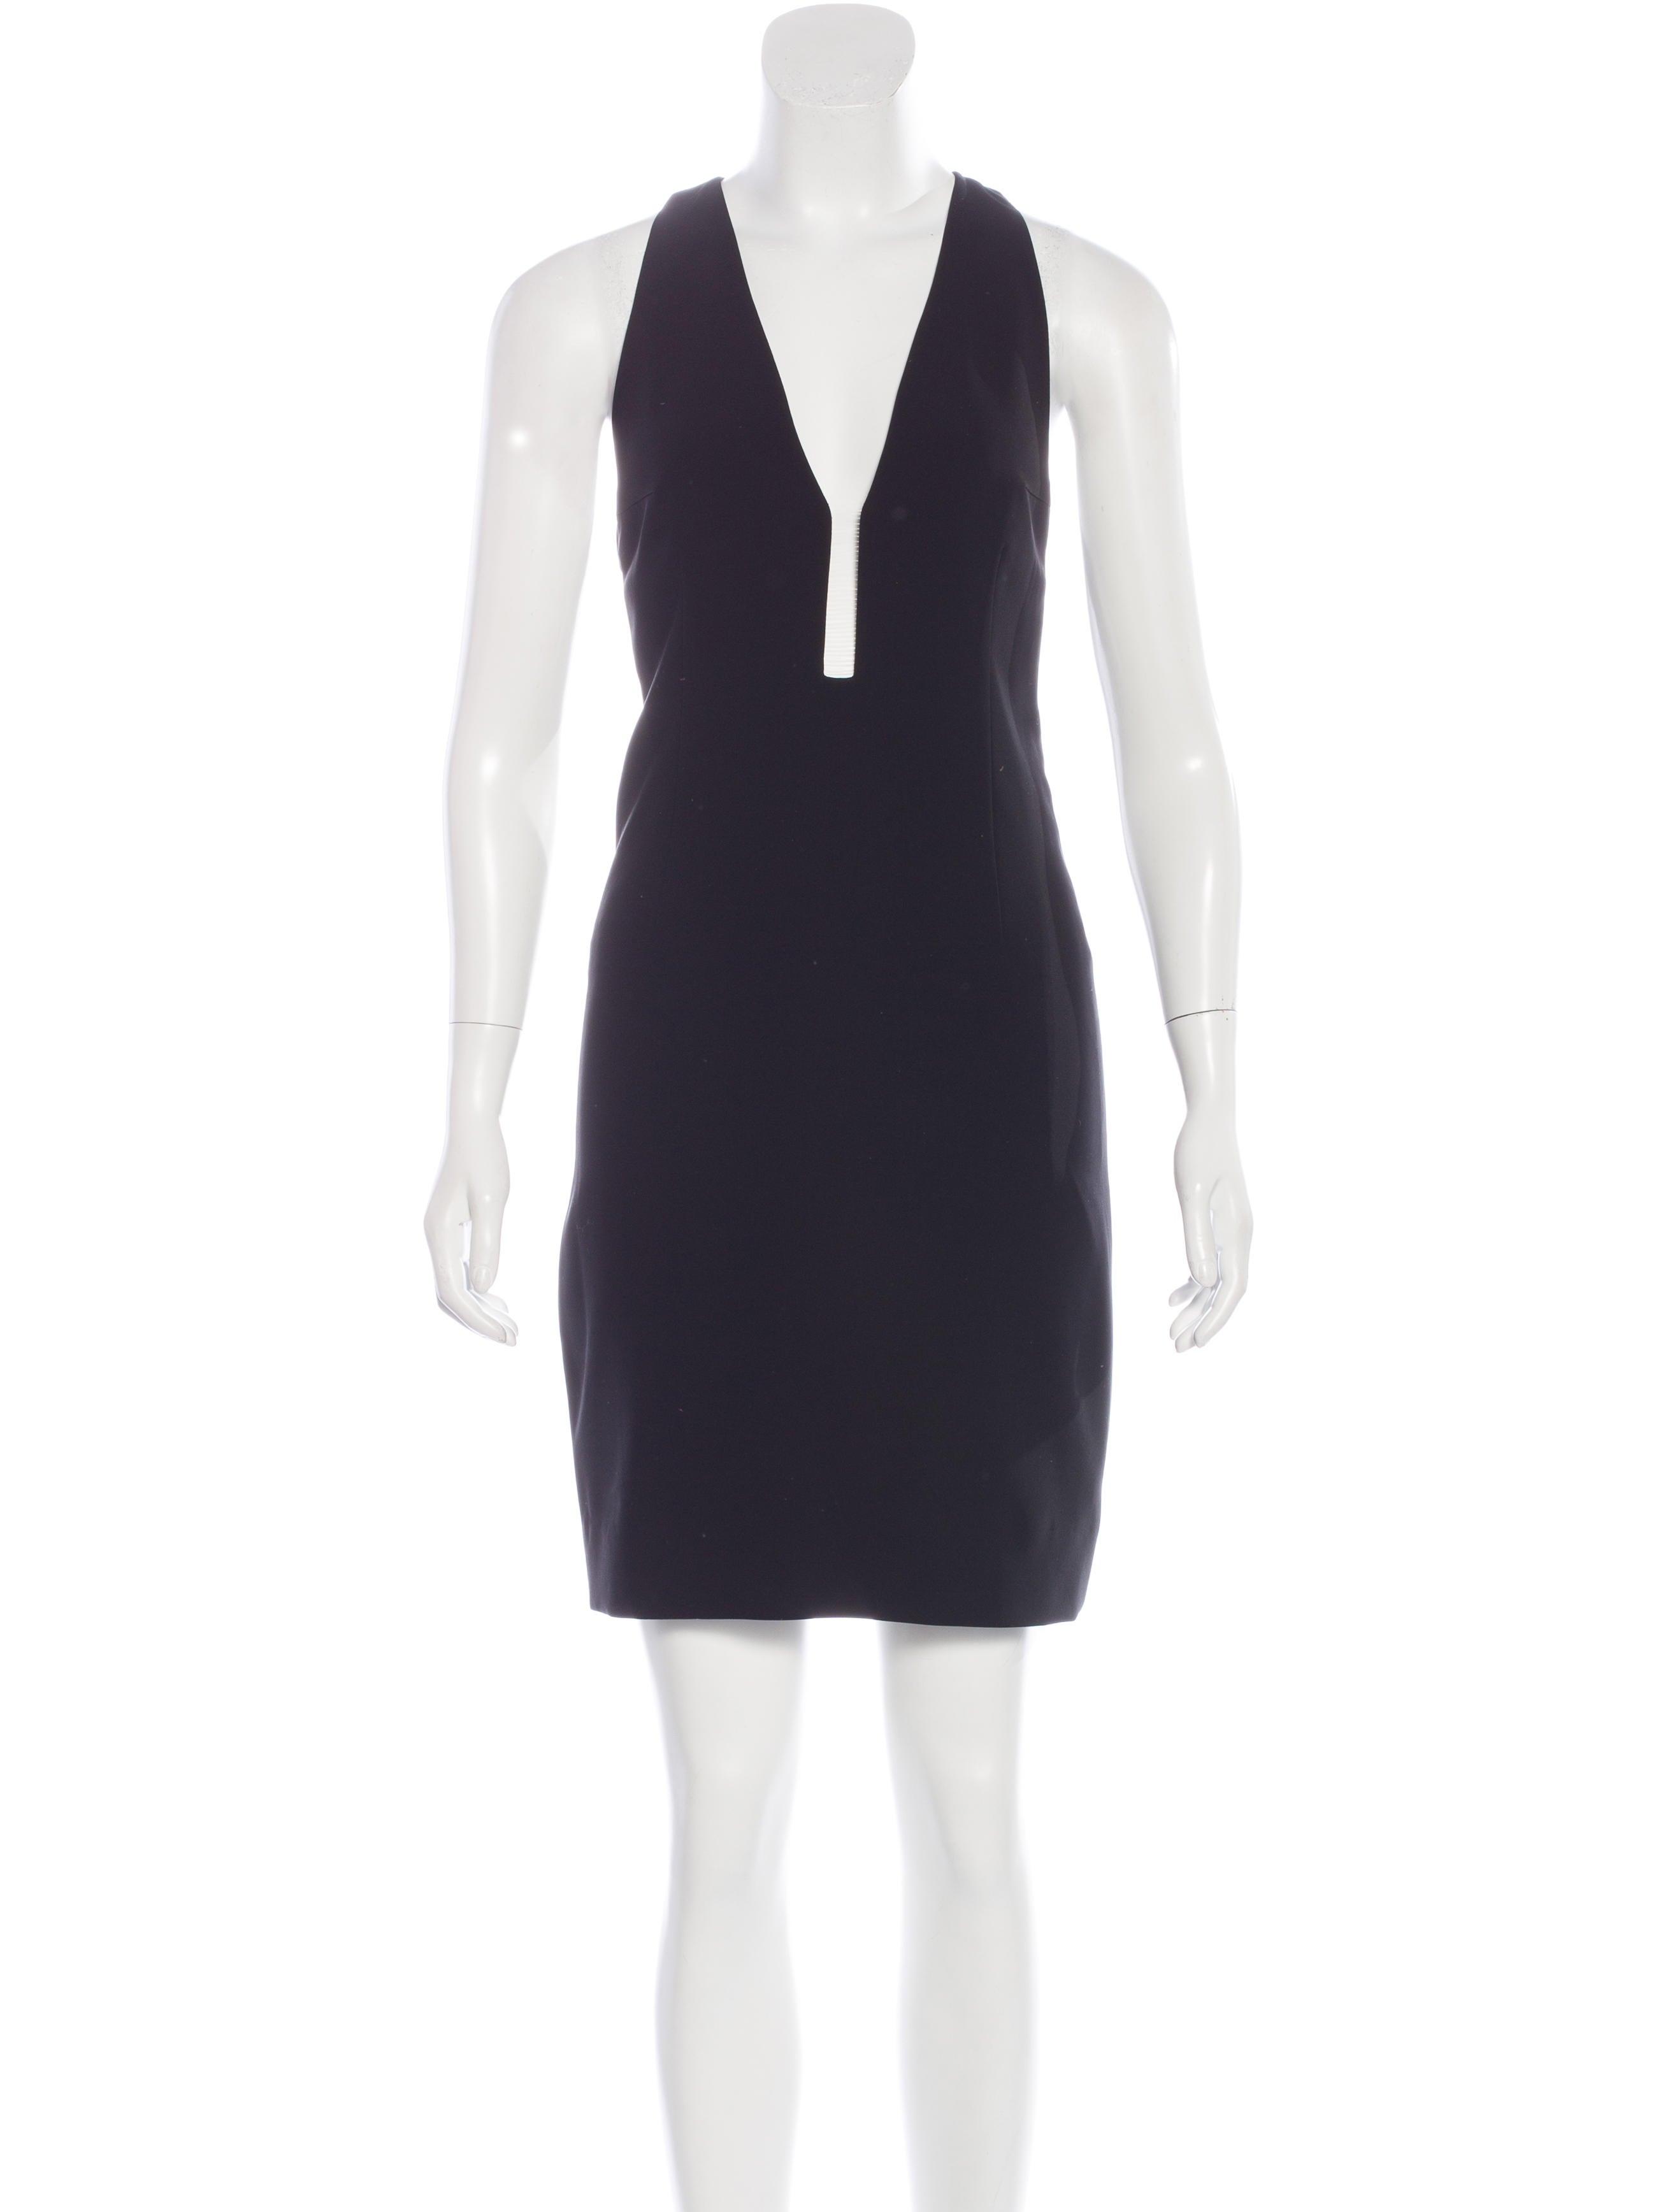 Alexander wang sleeveless mini dress dresses alx35543 for Alexander wang wedding dresses